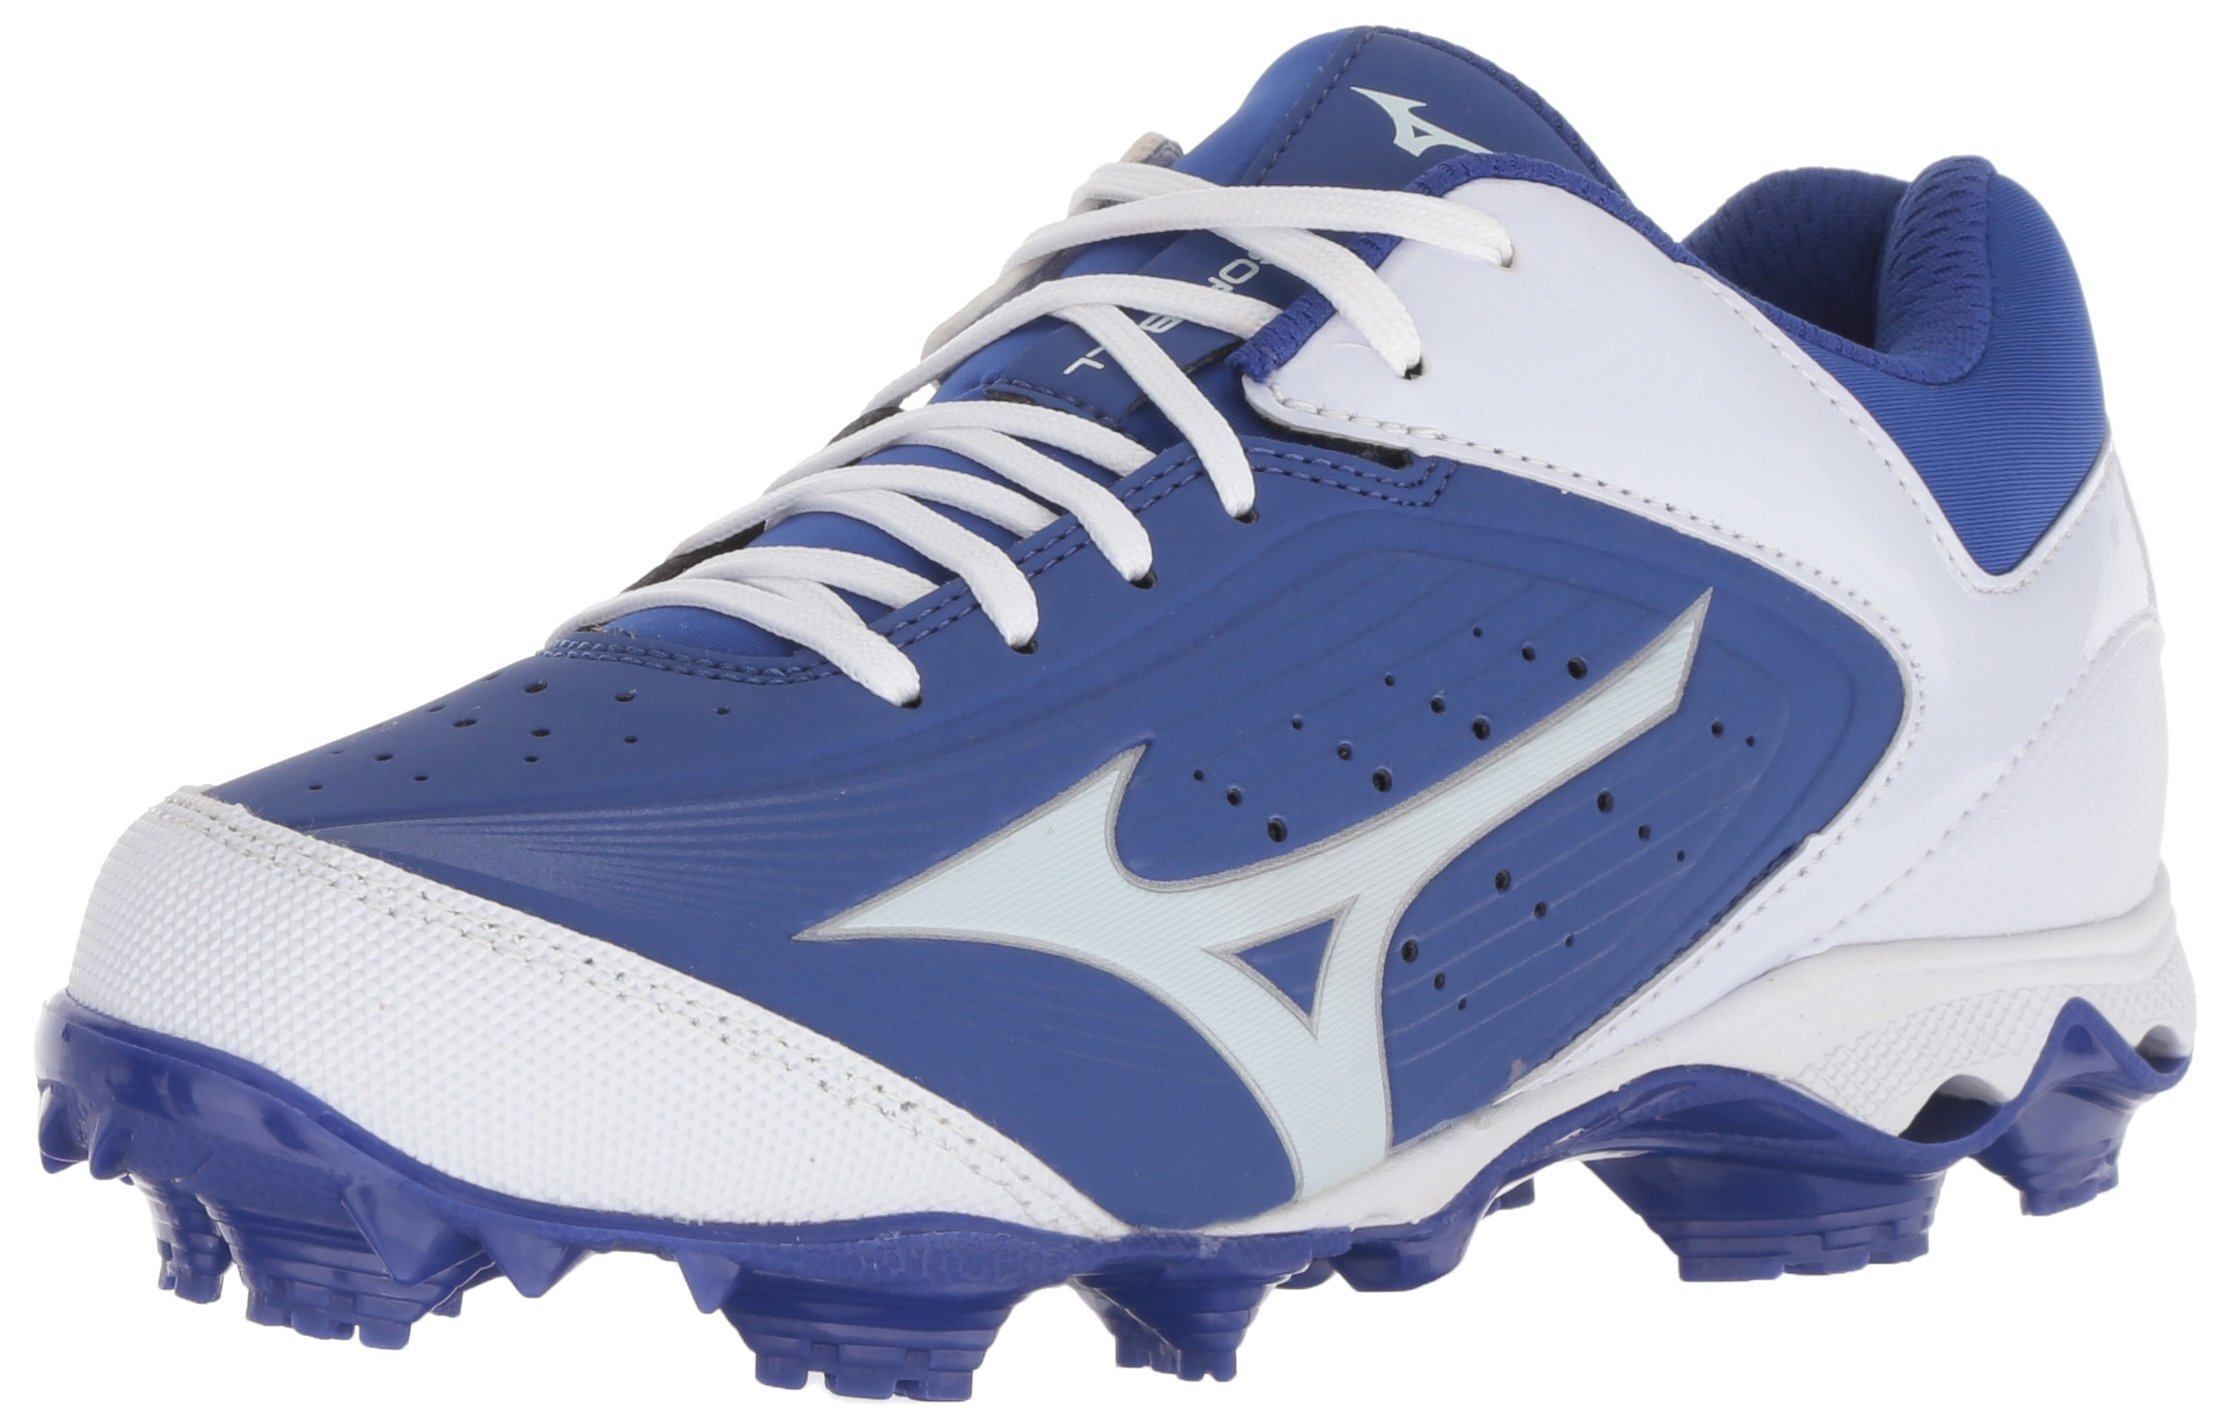 8c7429444d0f Mizuno (MIZD9) 9-Spike Advanced Finch Elite 3 Womens Fastpitch Softball  Cleat Shoe